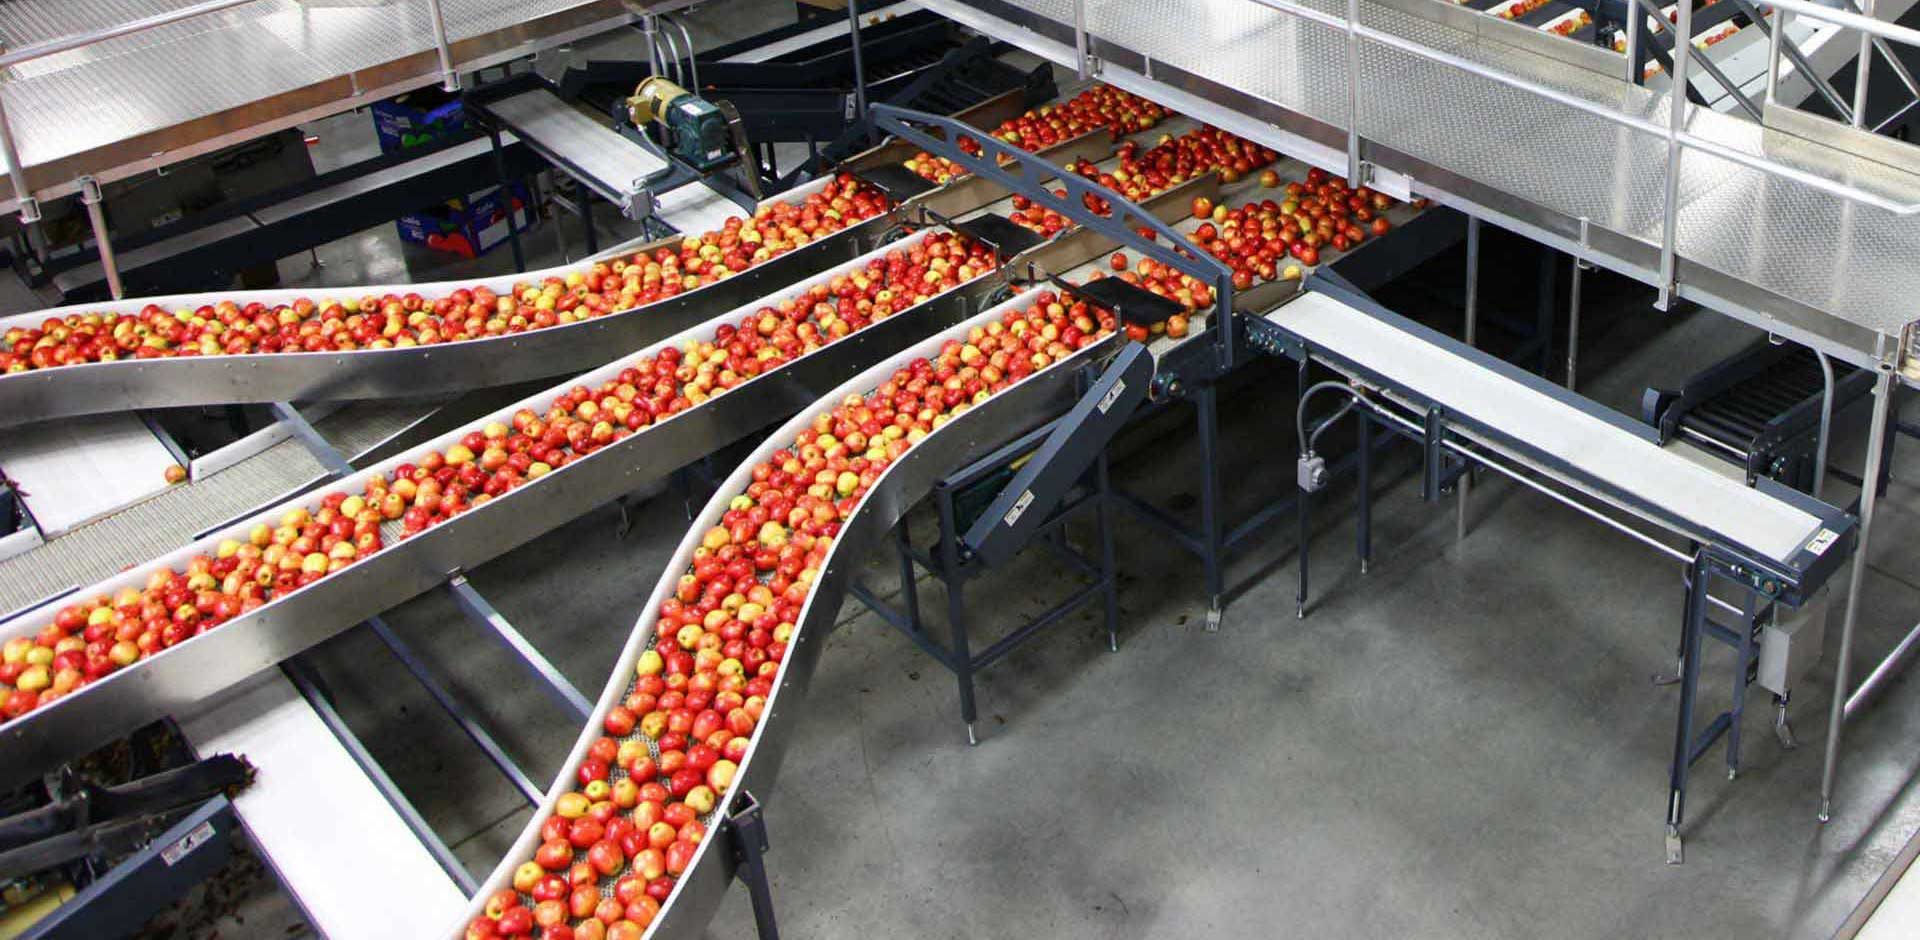 Apples on conveyor belts in a factory